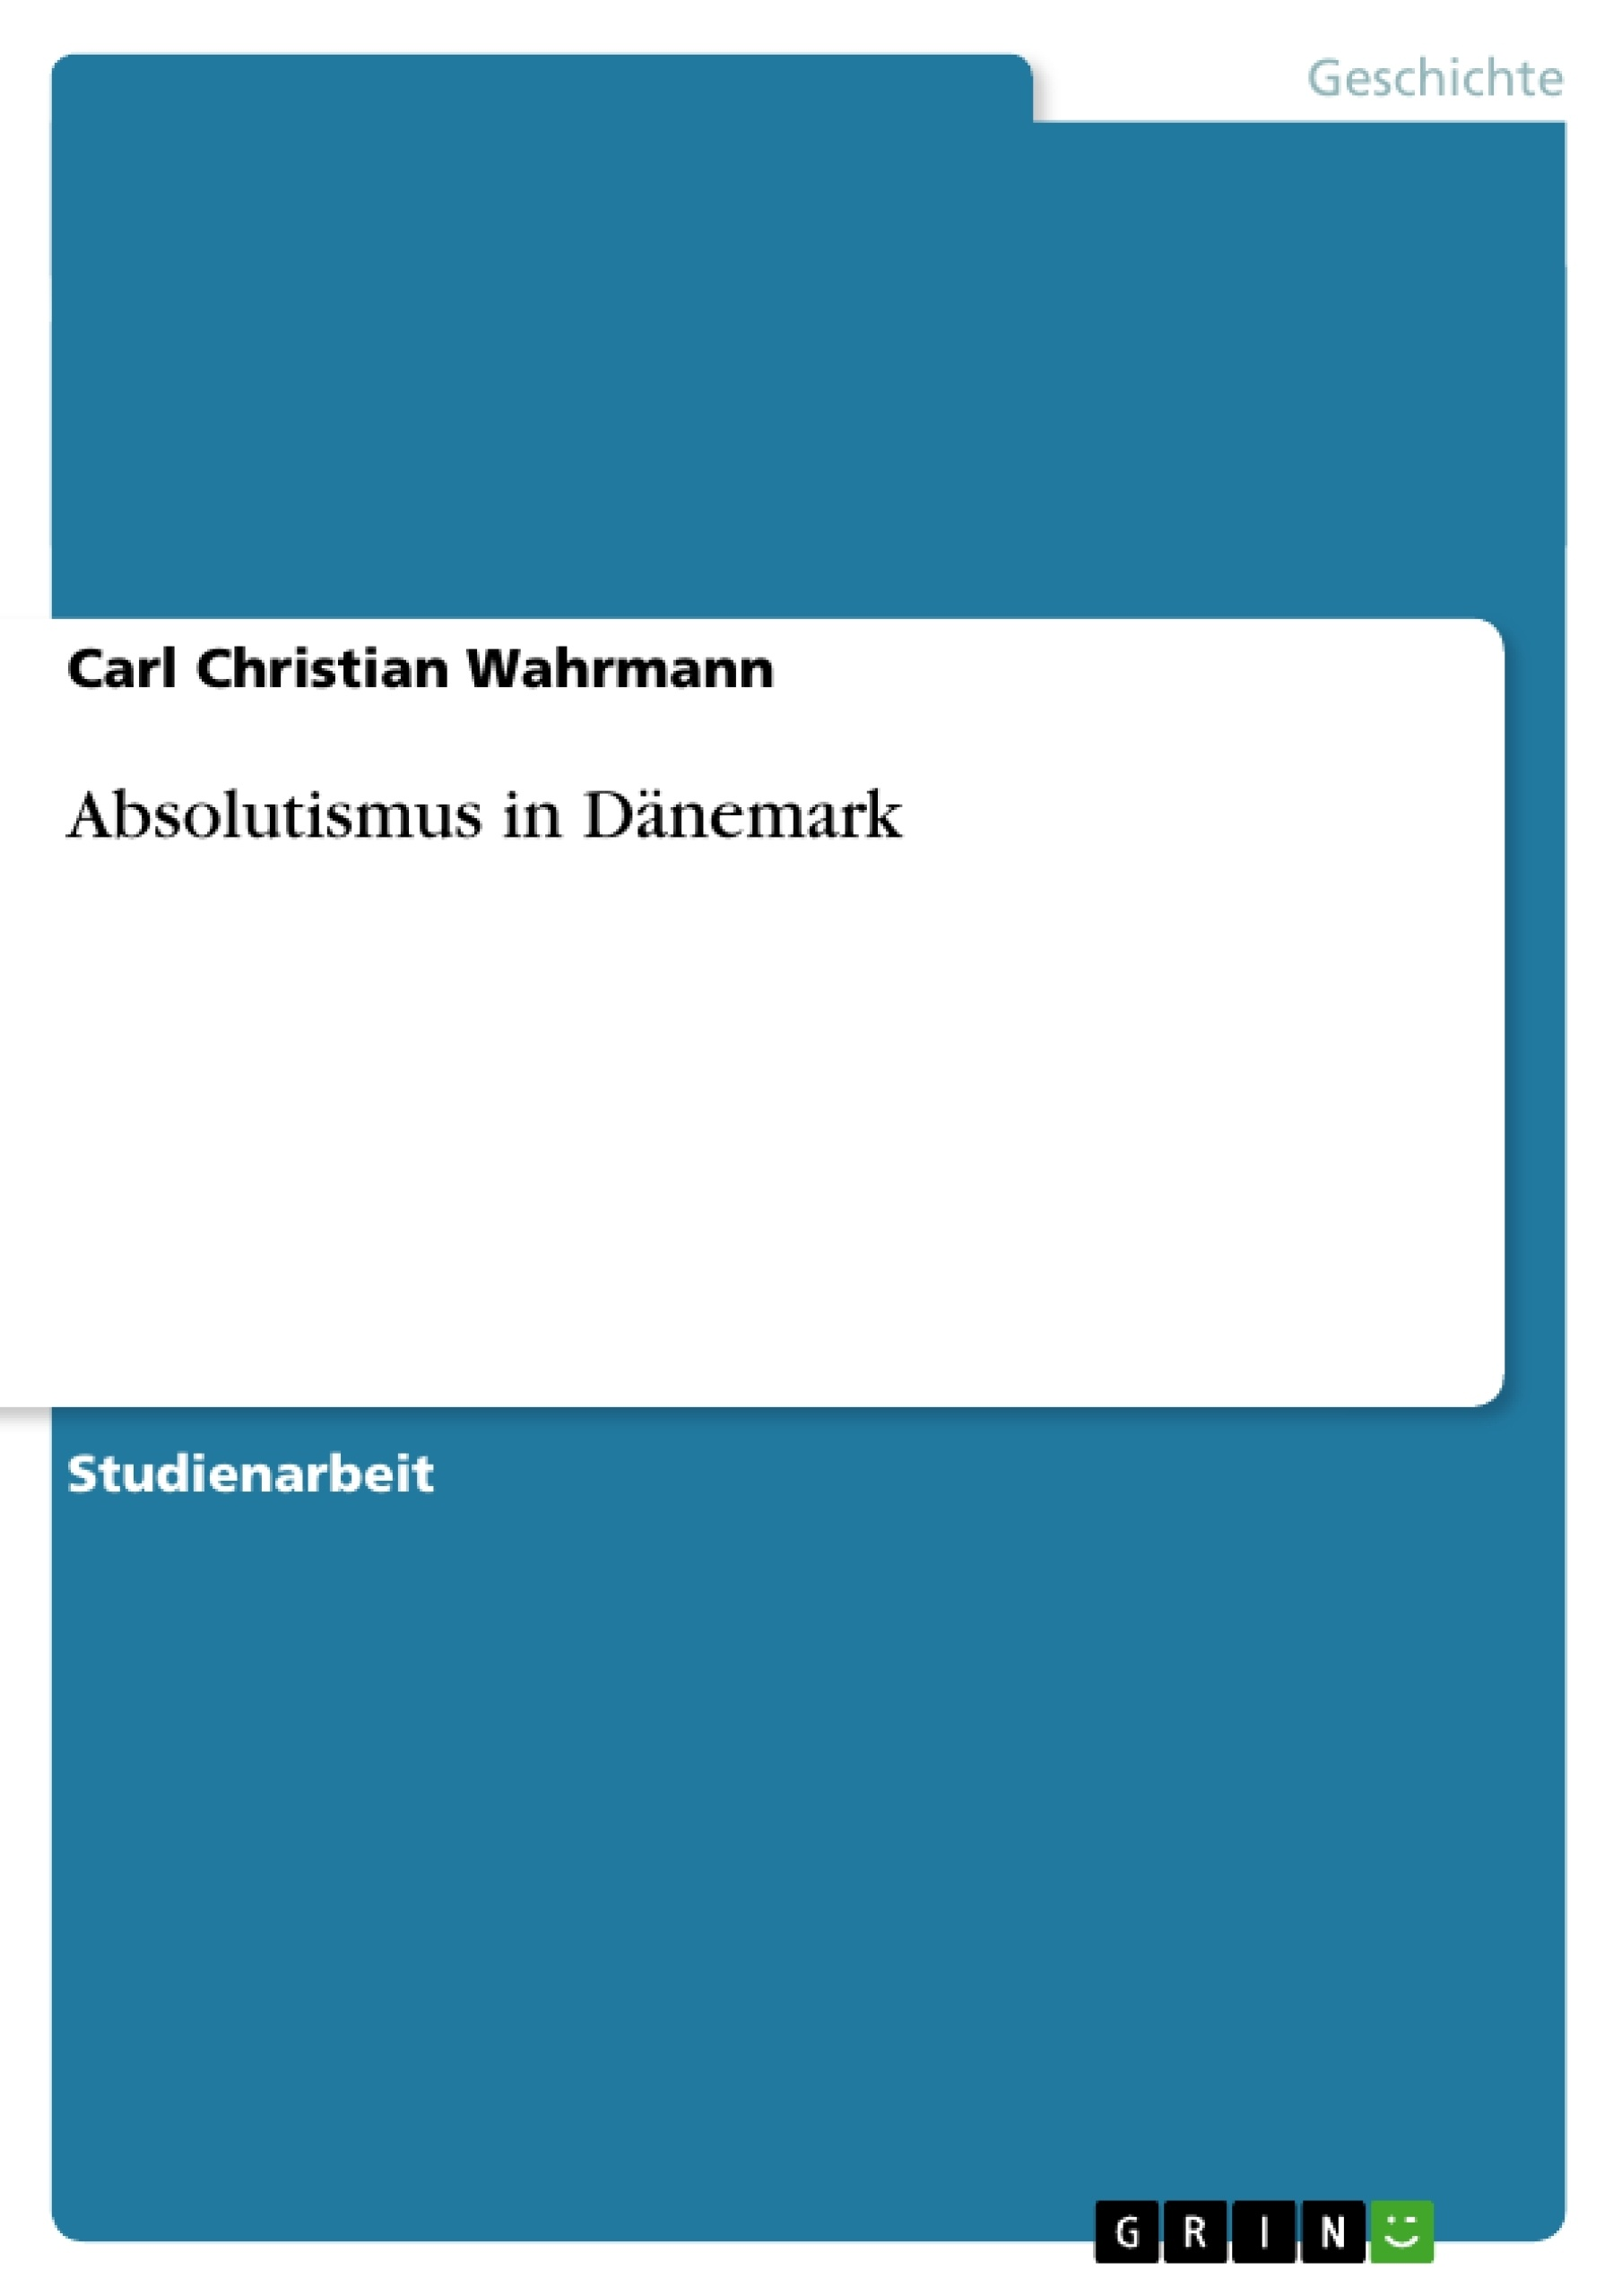 Titel: Absolutismus in Dänemark